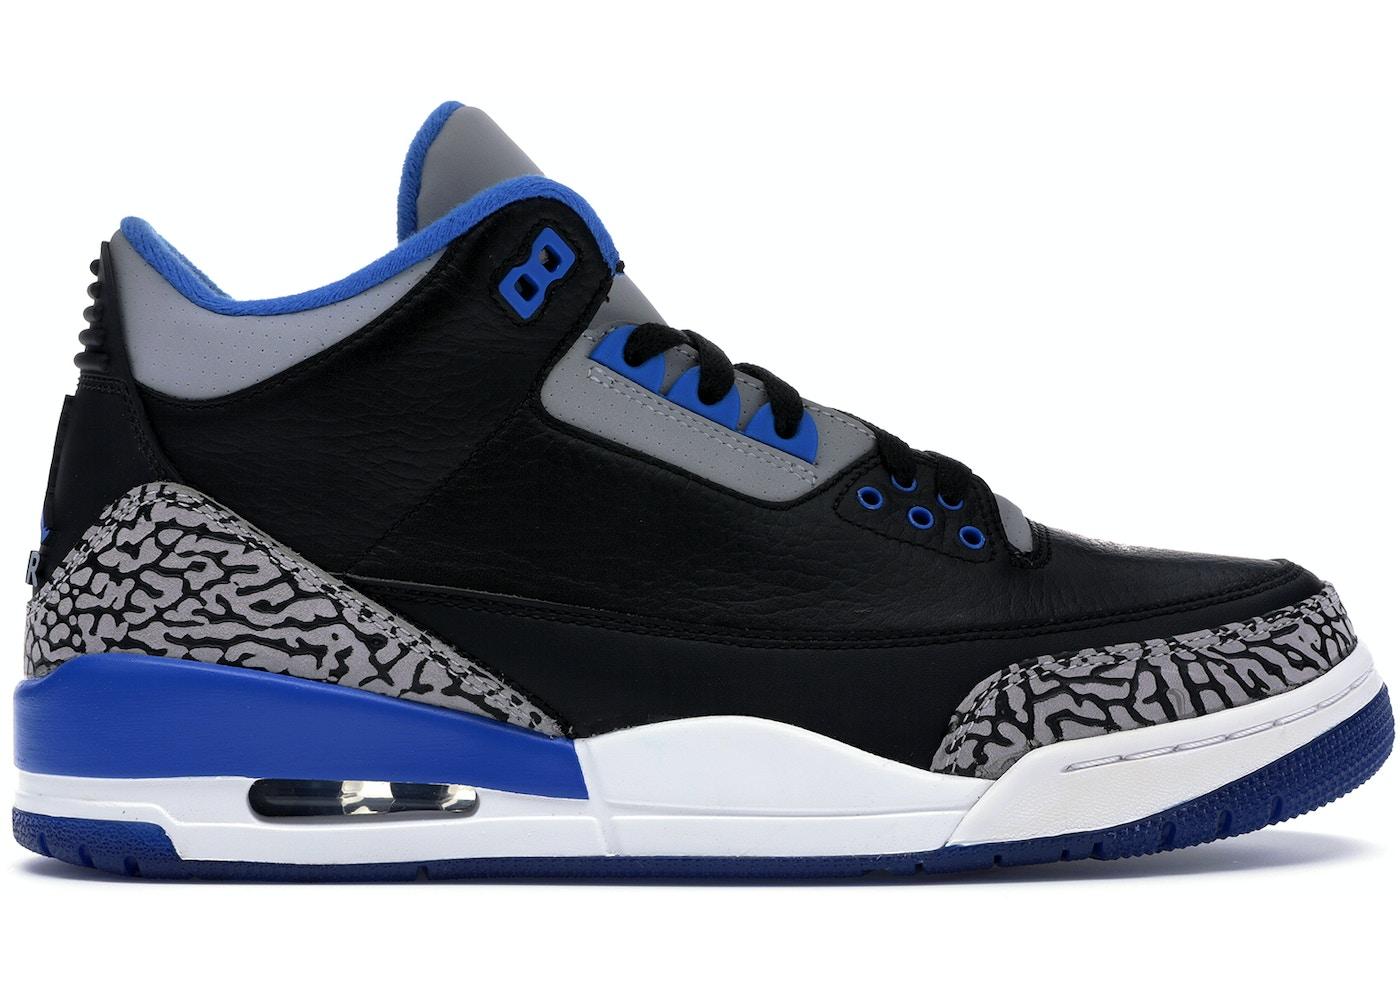 5afa25c1006fd8 Jordan 3 Retro Sport Blue - 136064-007